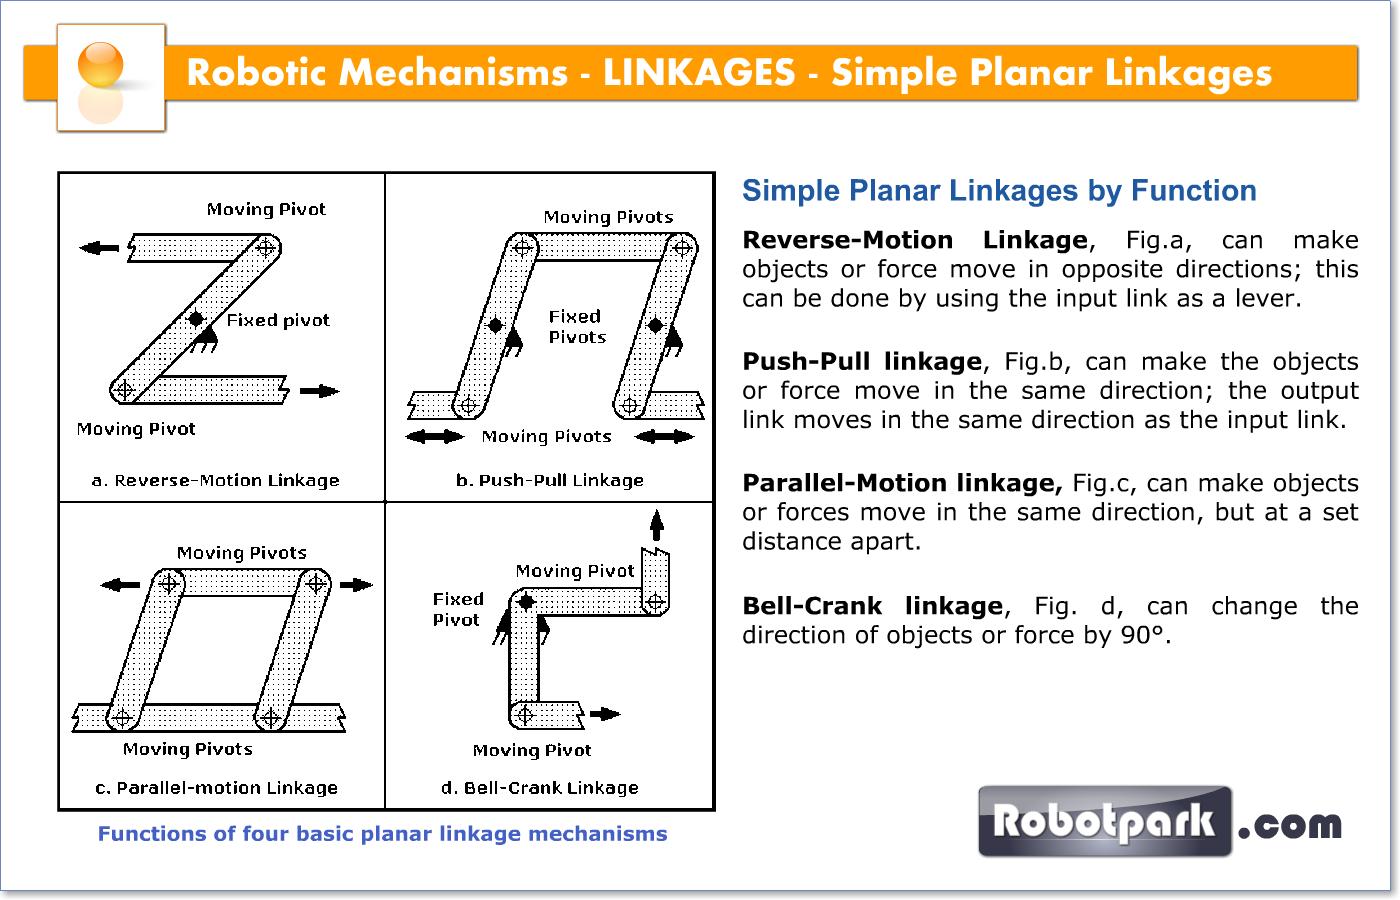 Rotating Push Pull Linkage : Robotic mechanisms linkages simple planar